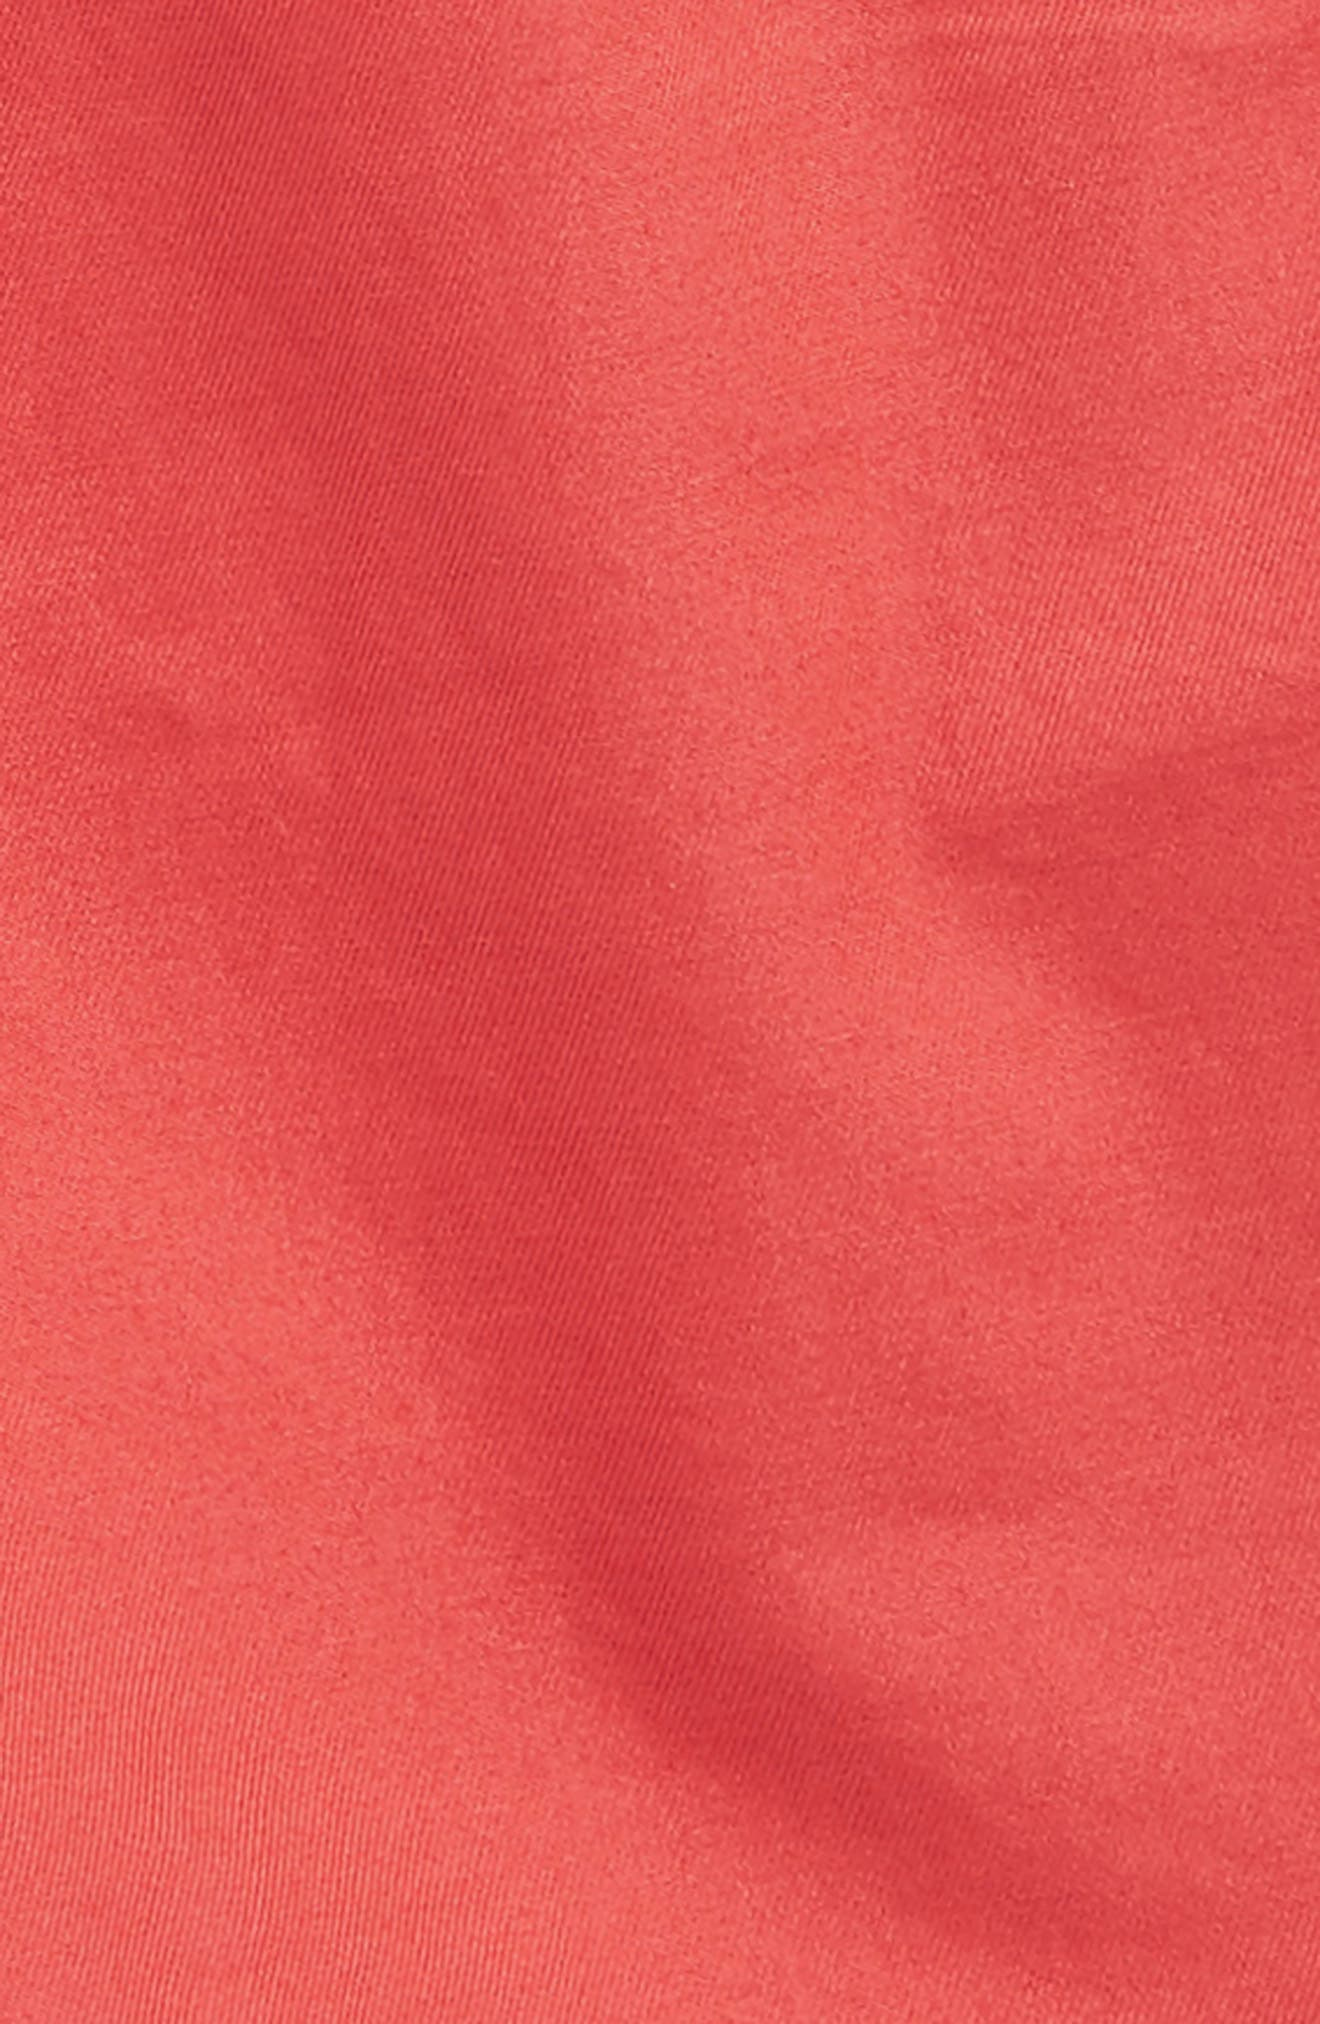 Elastic Waist Shorts,                             Alternate thumbnail 6, color,